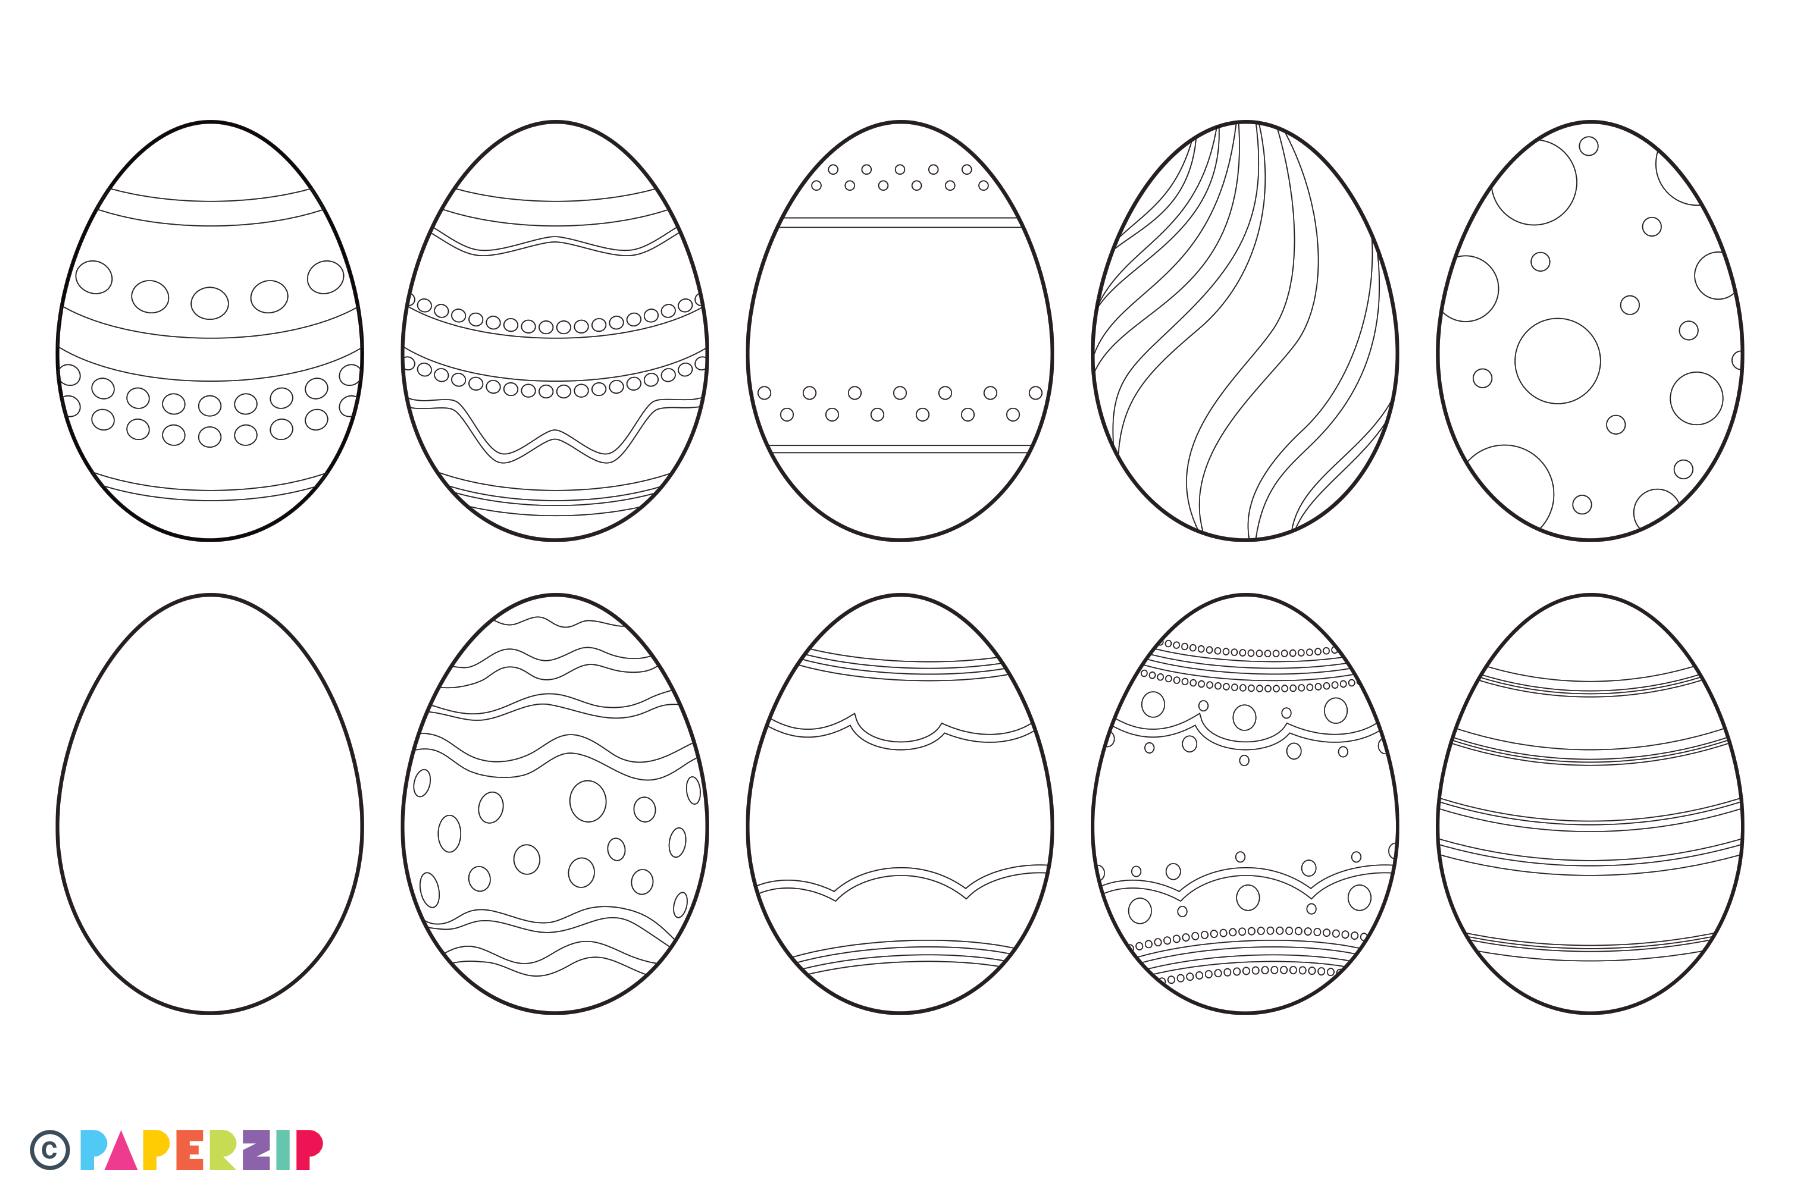 picture regarding Easter Egg Template Free Printable named Blank Easter Eggs - PAPERZIP